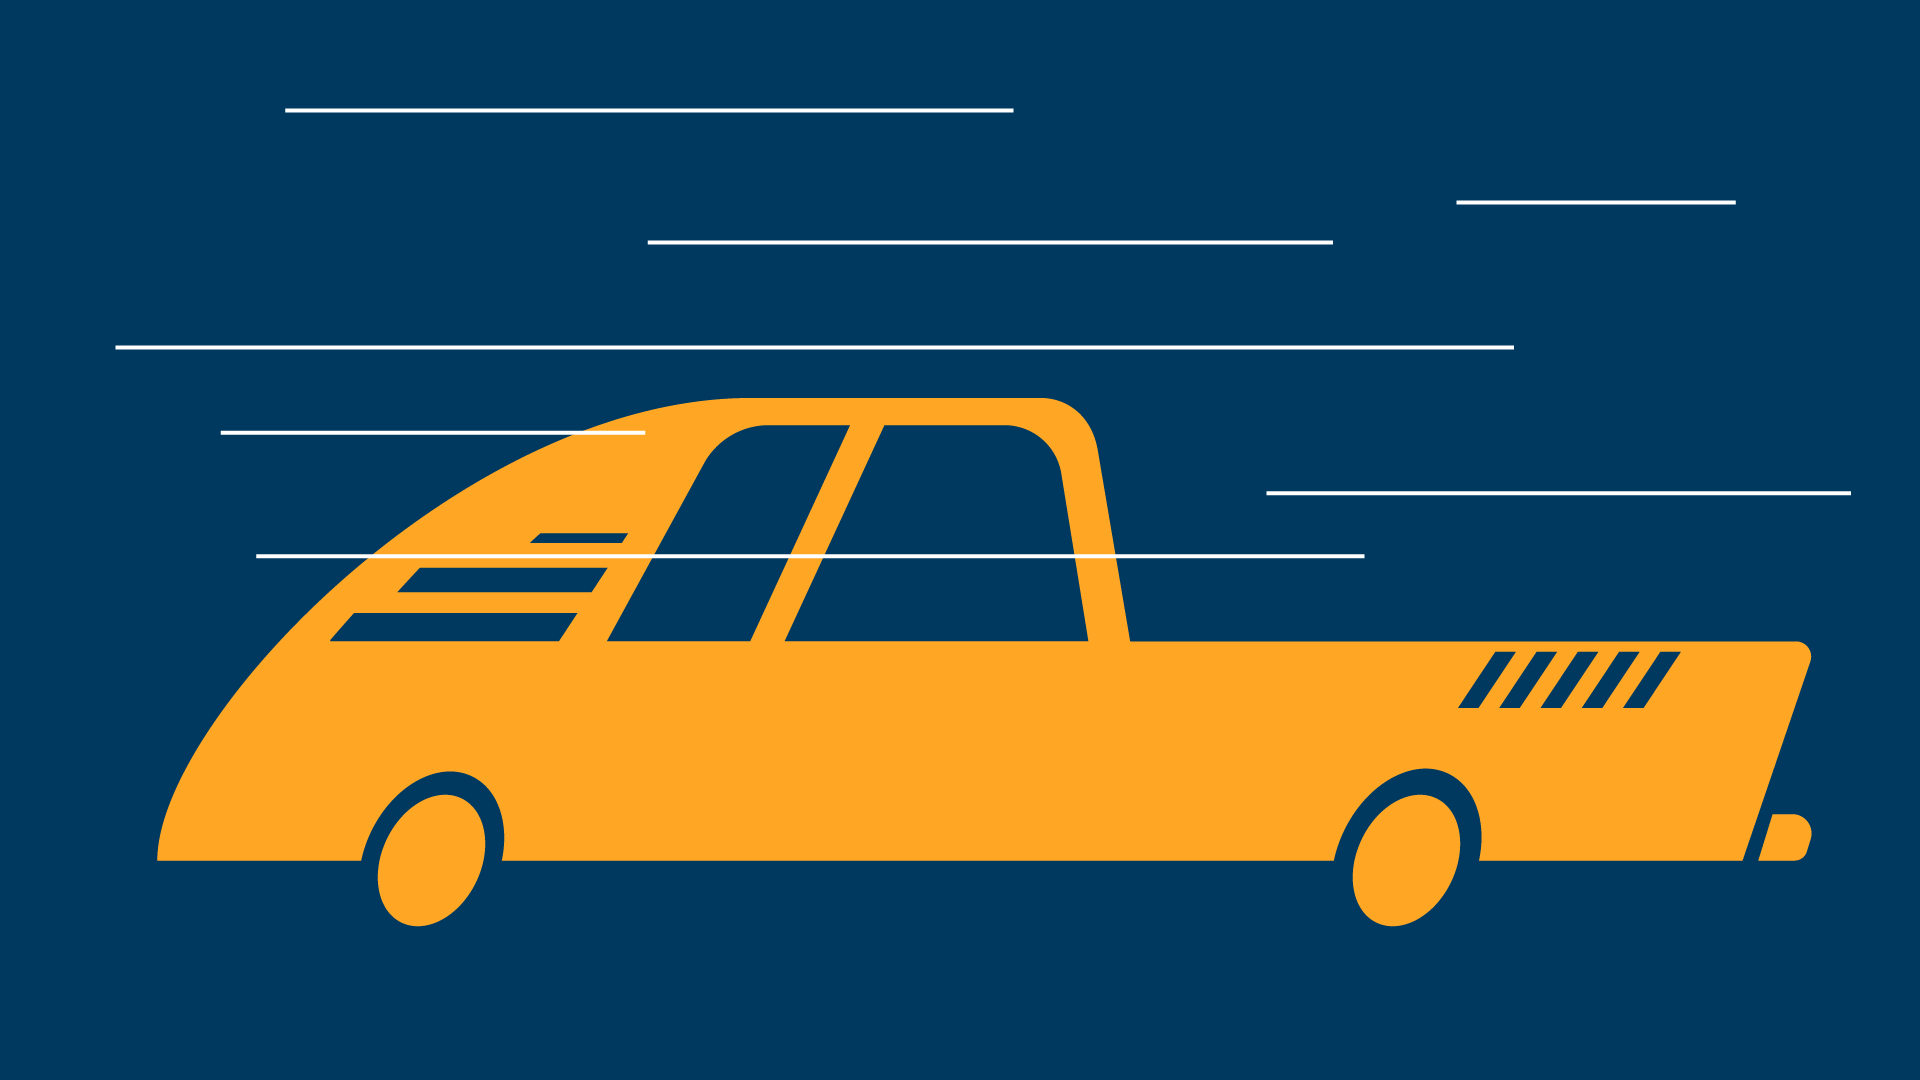 Car_Design.png